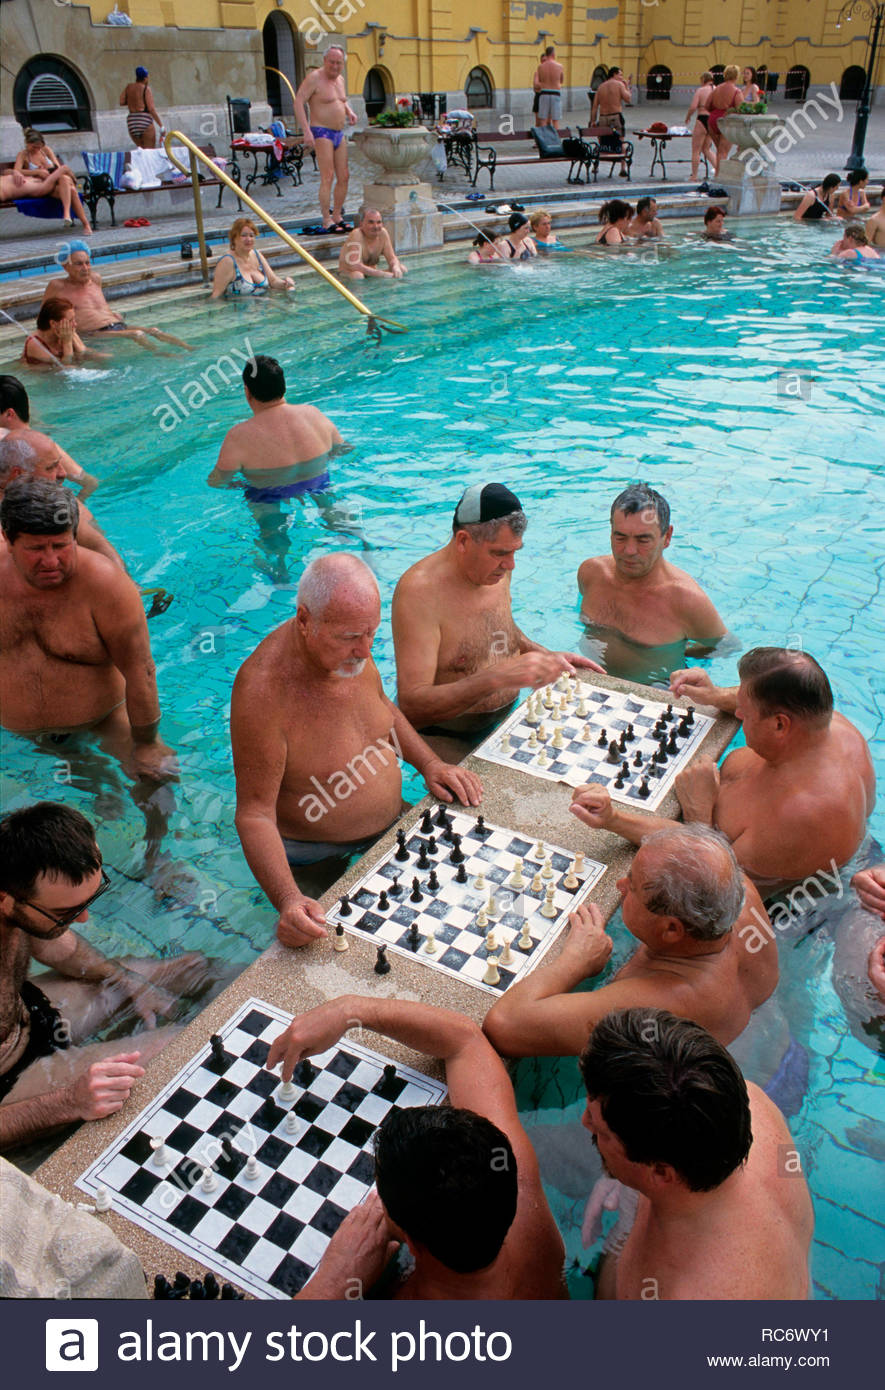 szechenyi thermal bath, varosliget park, budapest - Stock Image